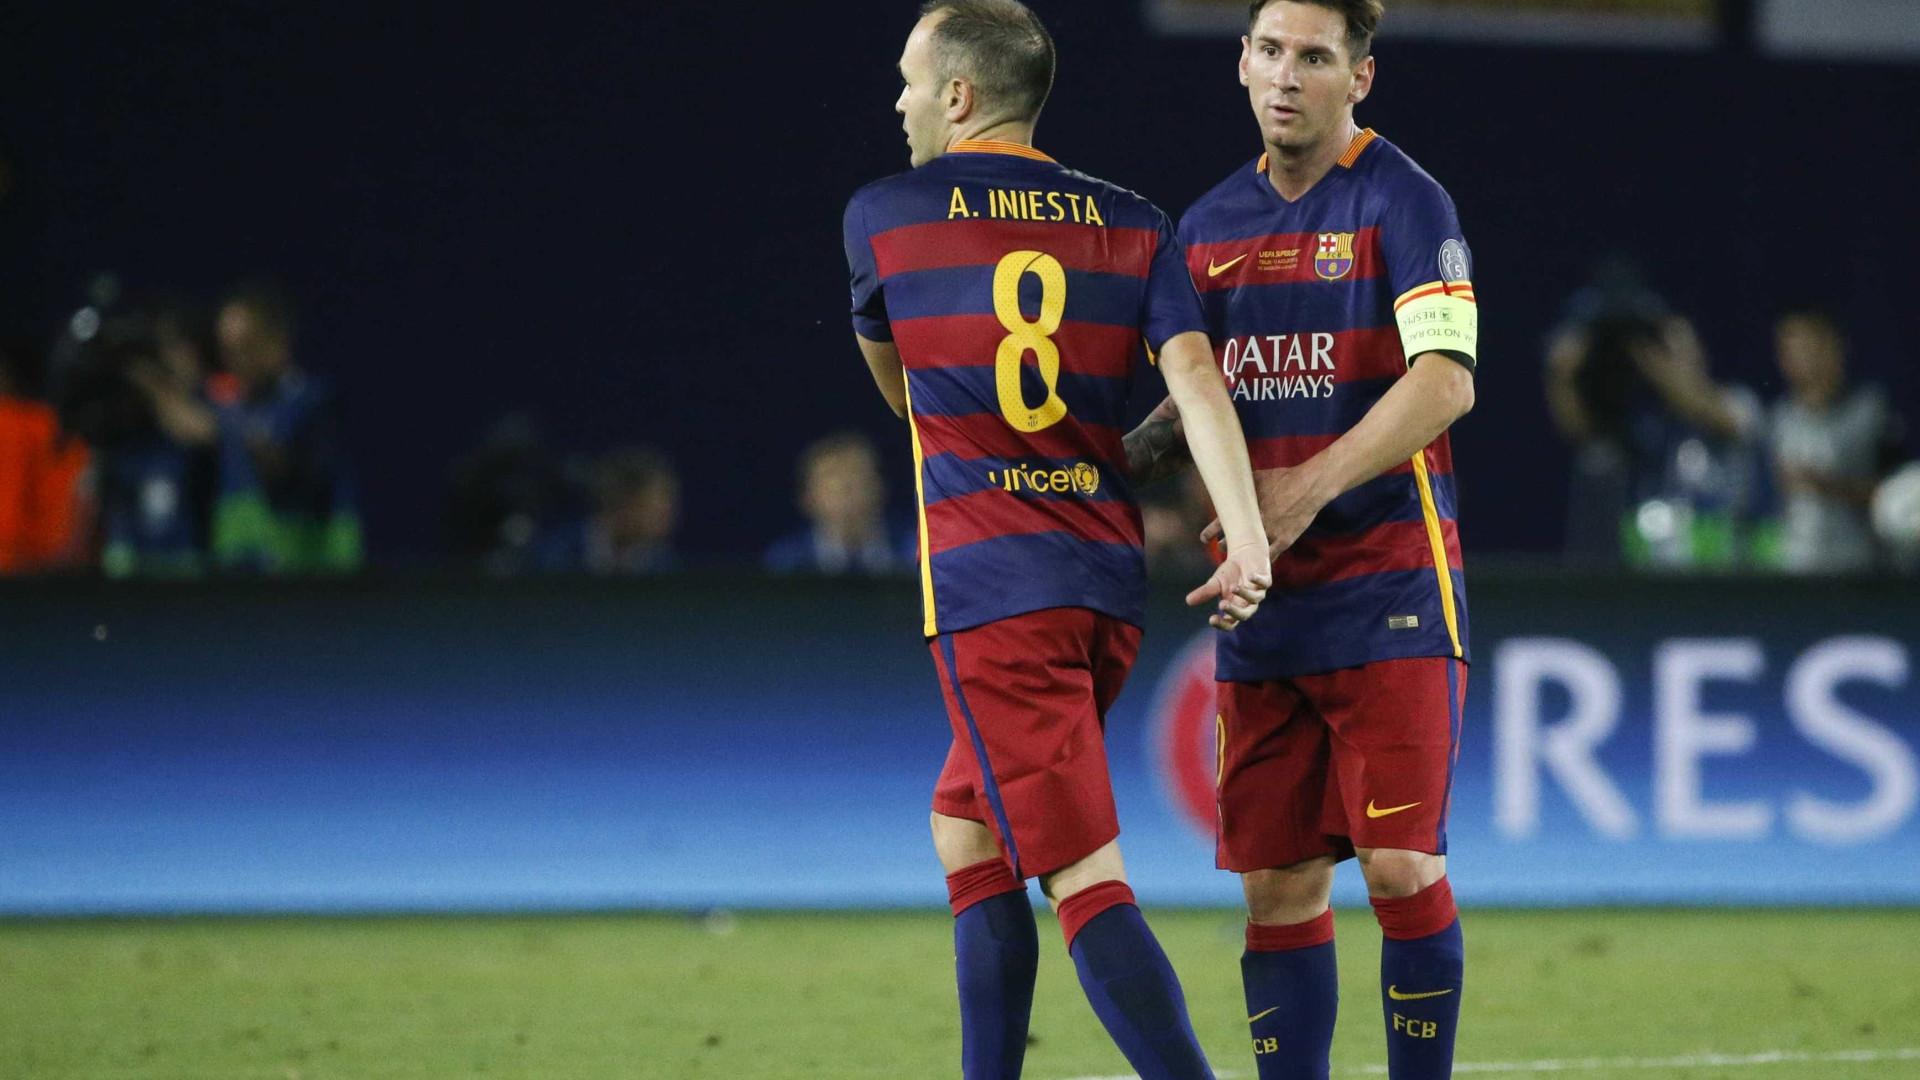 Continuidade no Barcelona? Iniesta deixa dúvidas no ar